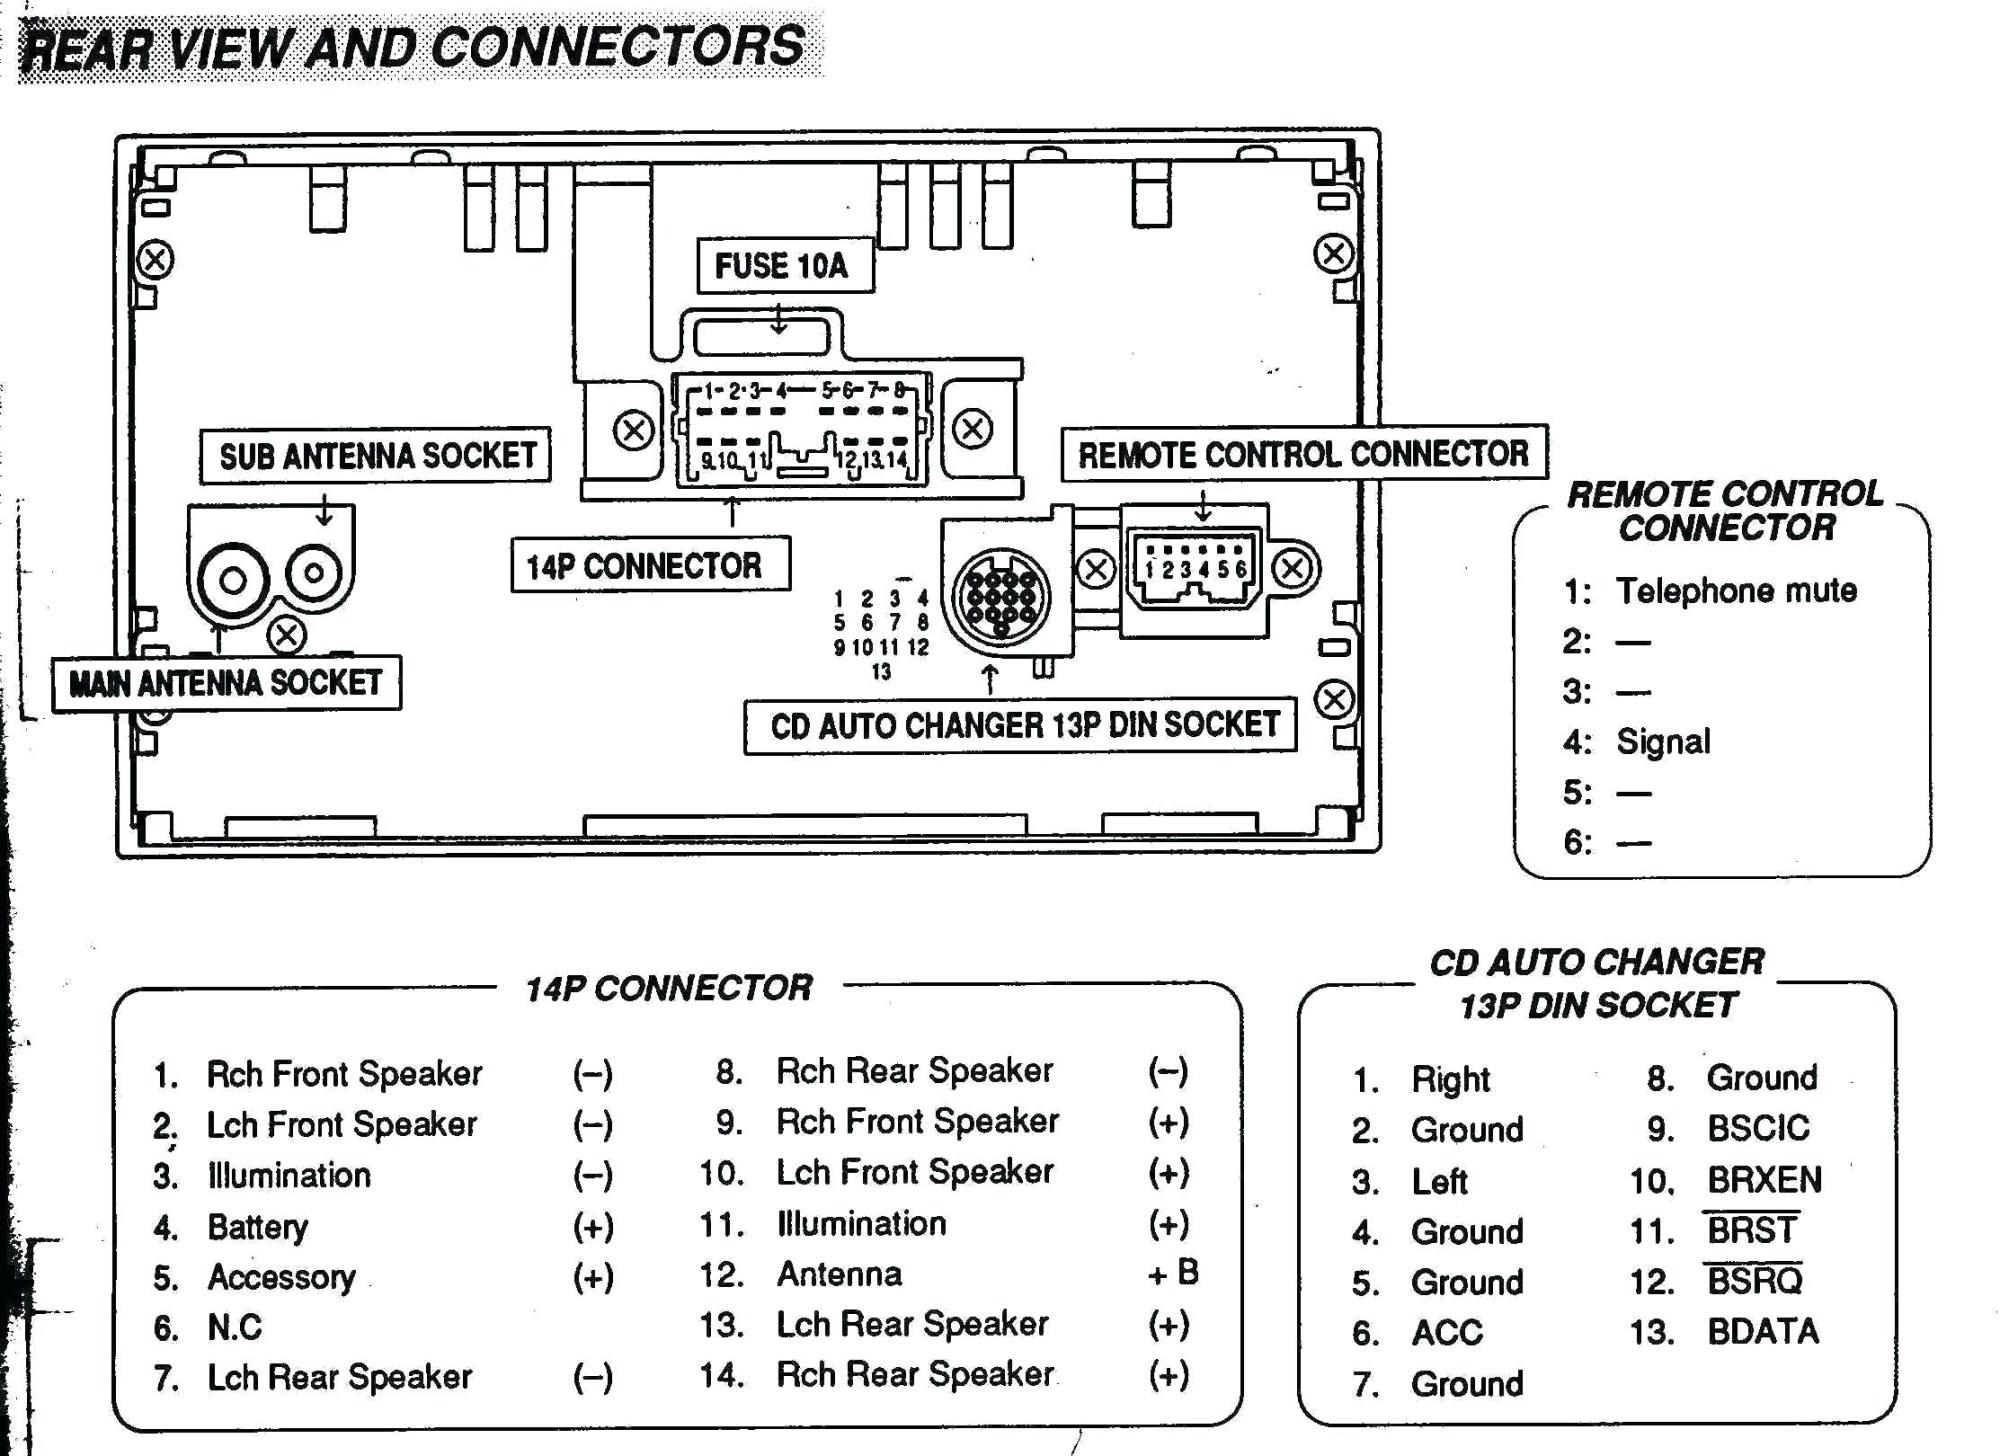 hight resolution of chrysler pacifica engine diagram 2004 chrysler pacifica car radio wiring diagram stereo fresh diagra of chrysler